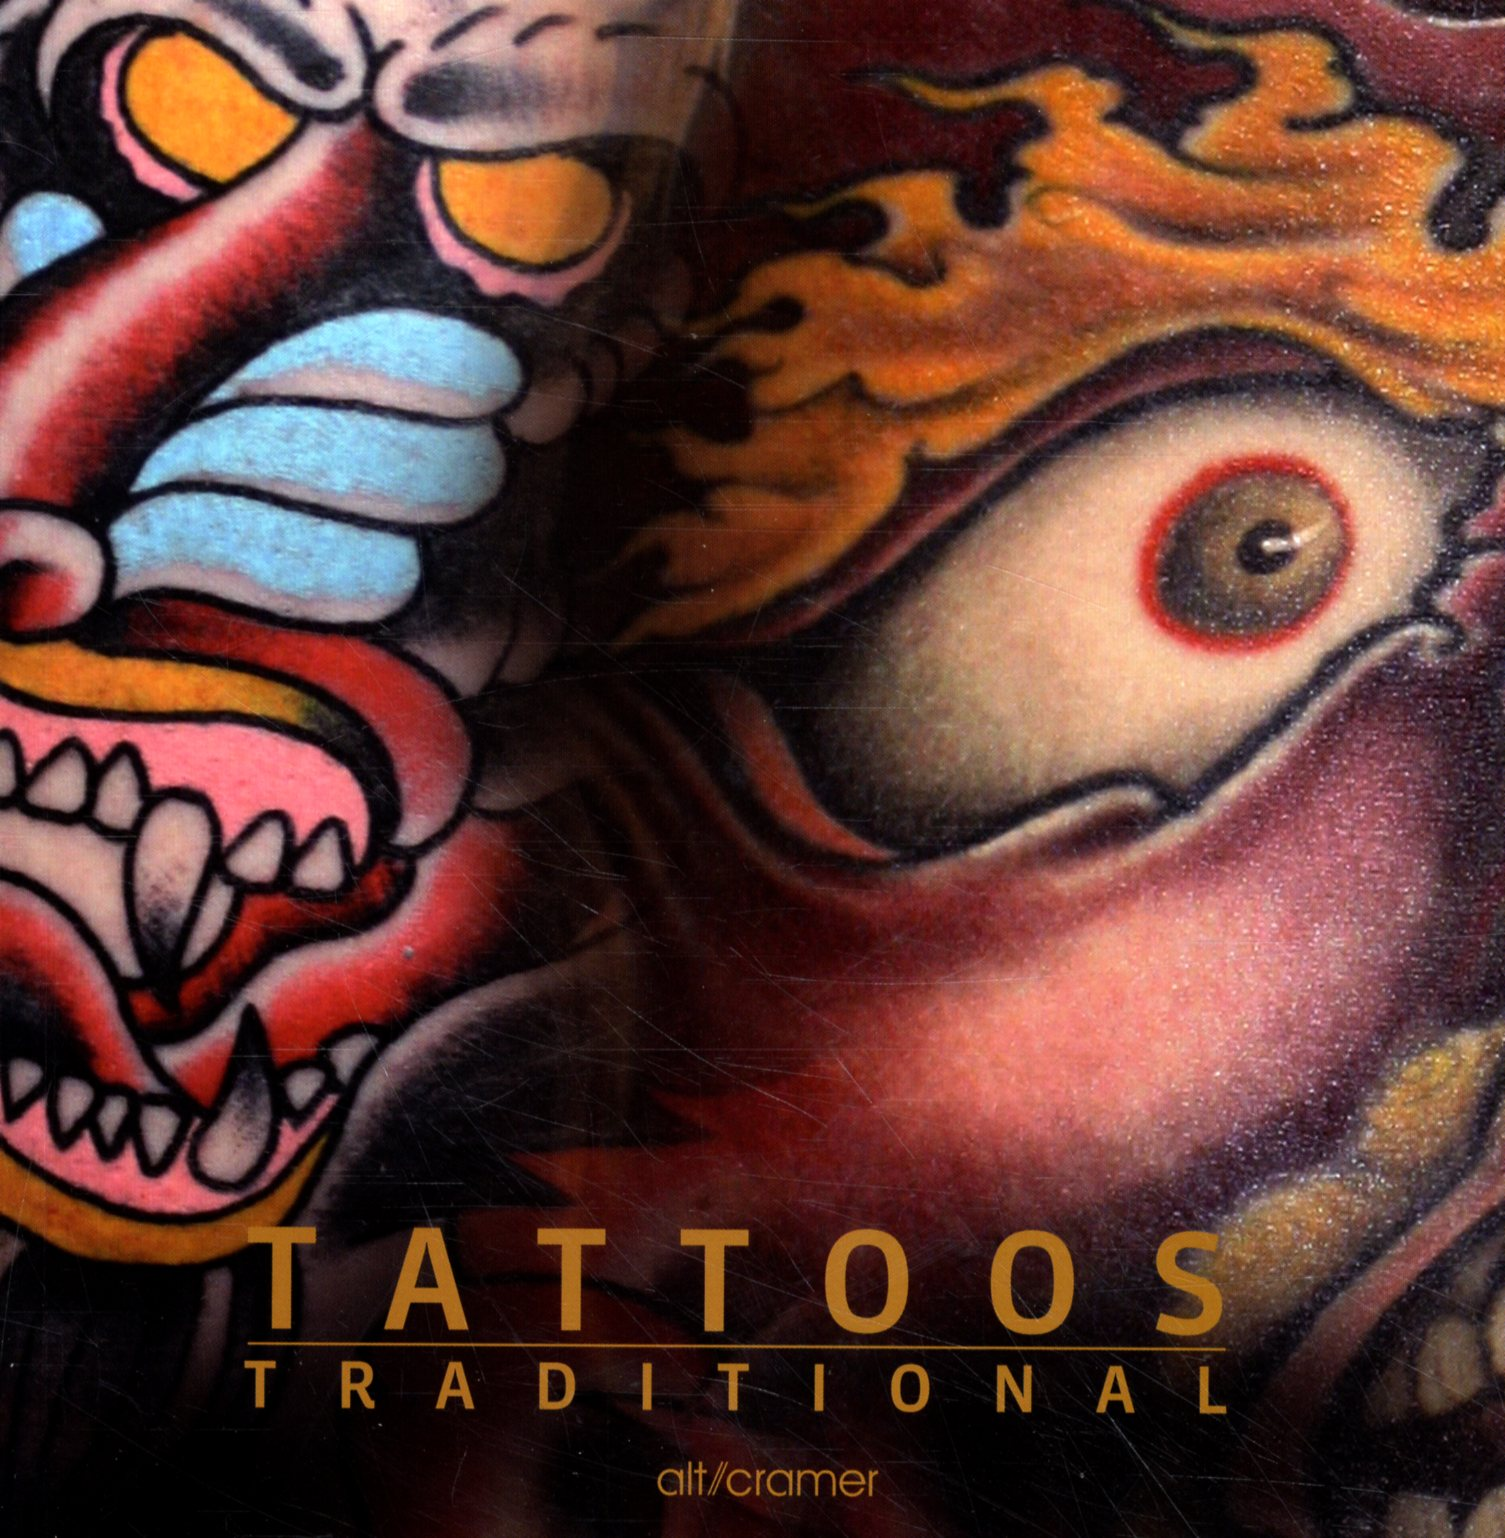 Tattoos Traditional